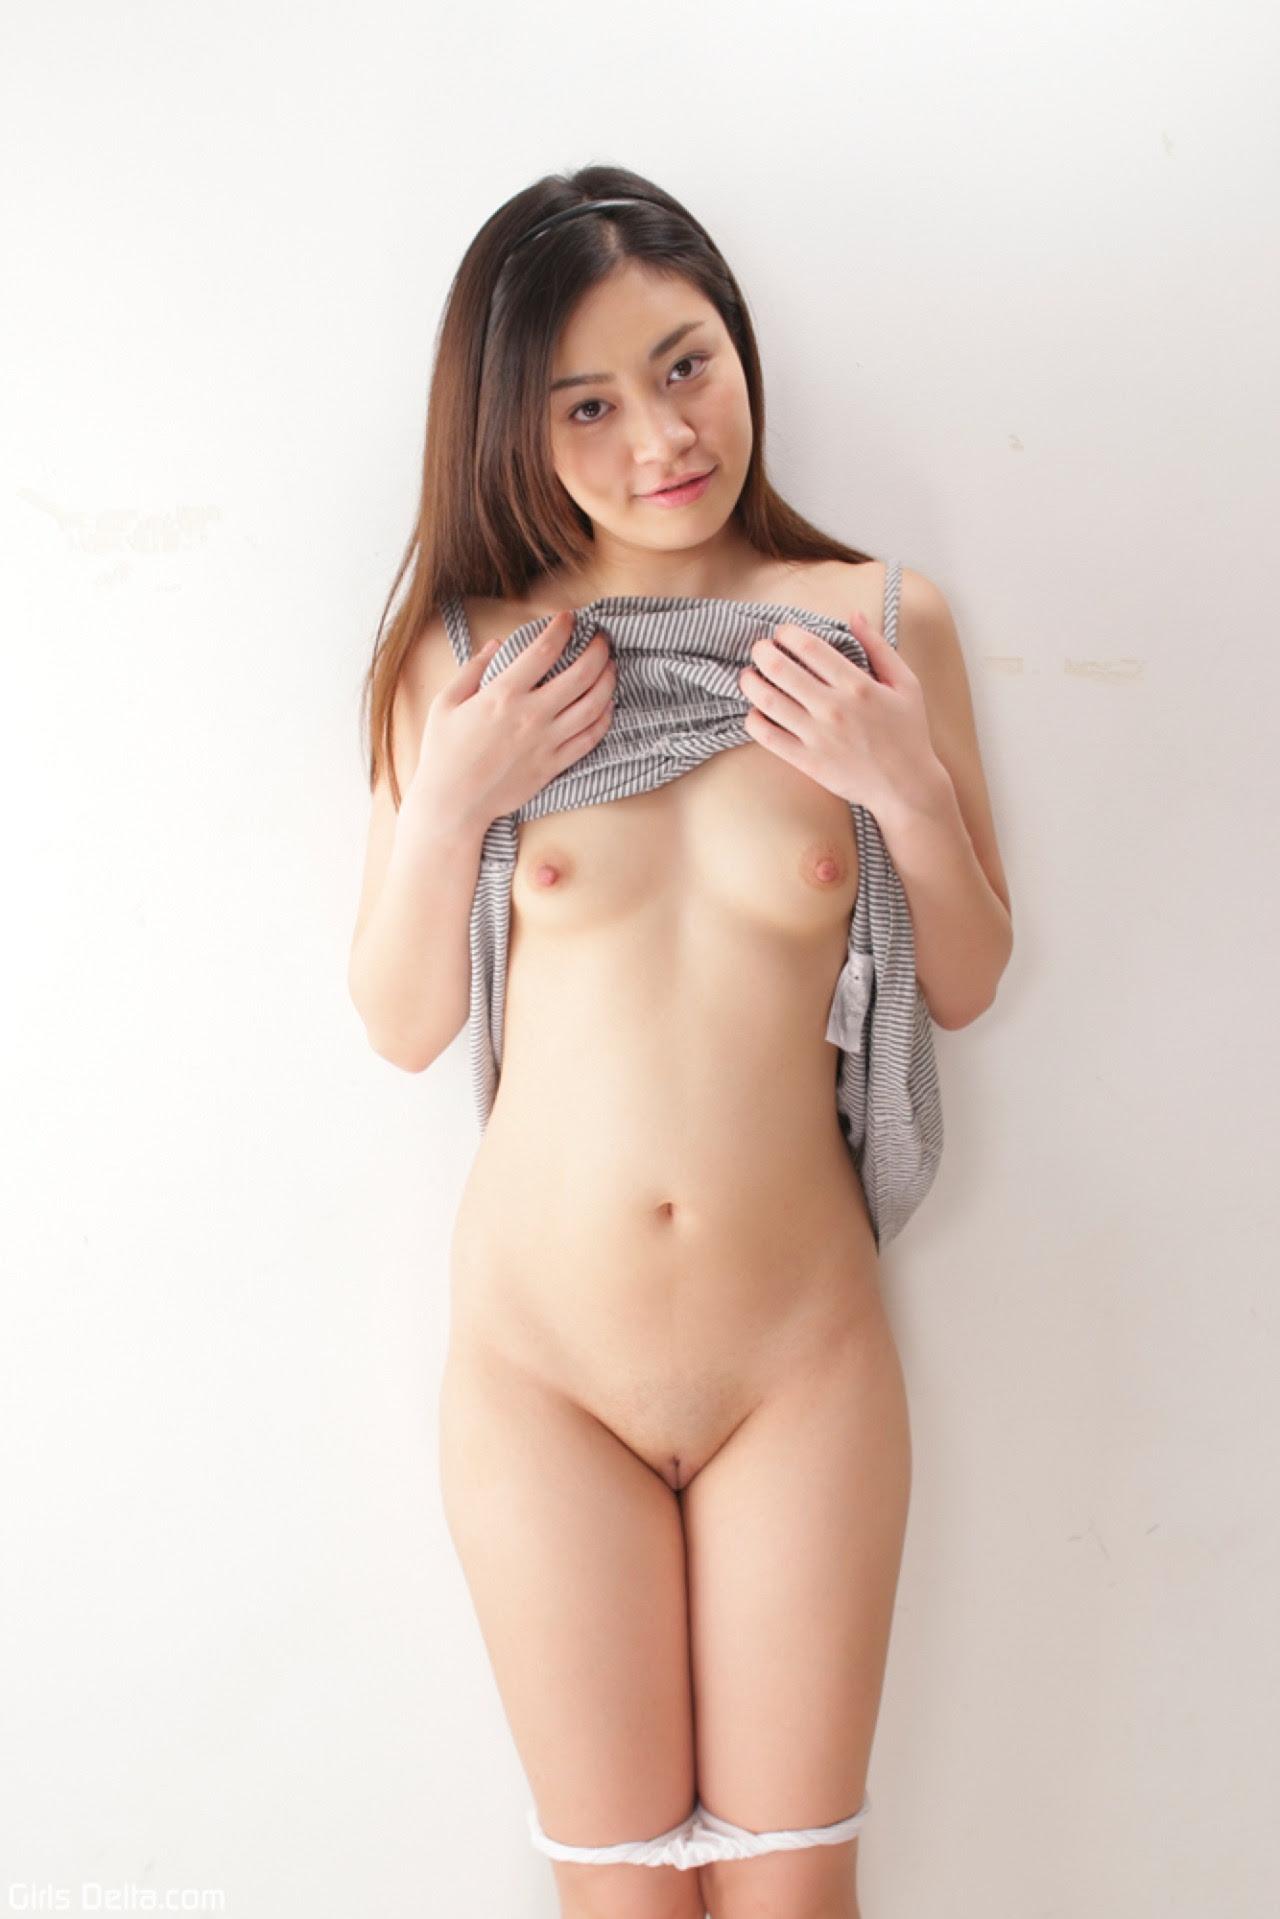 Hot Girls With Gaps | xPornxxvl